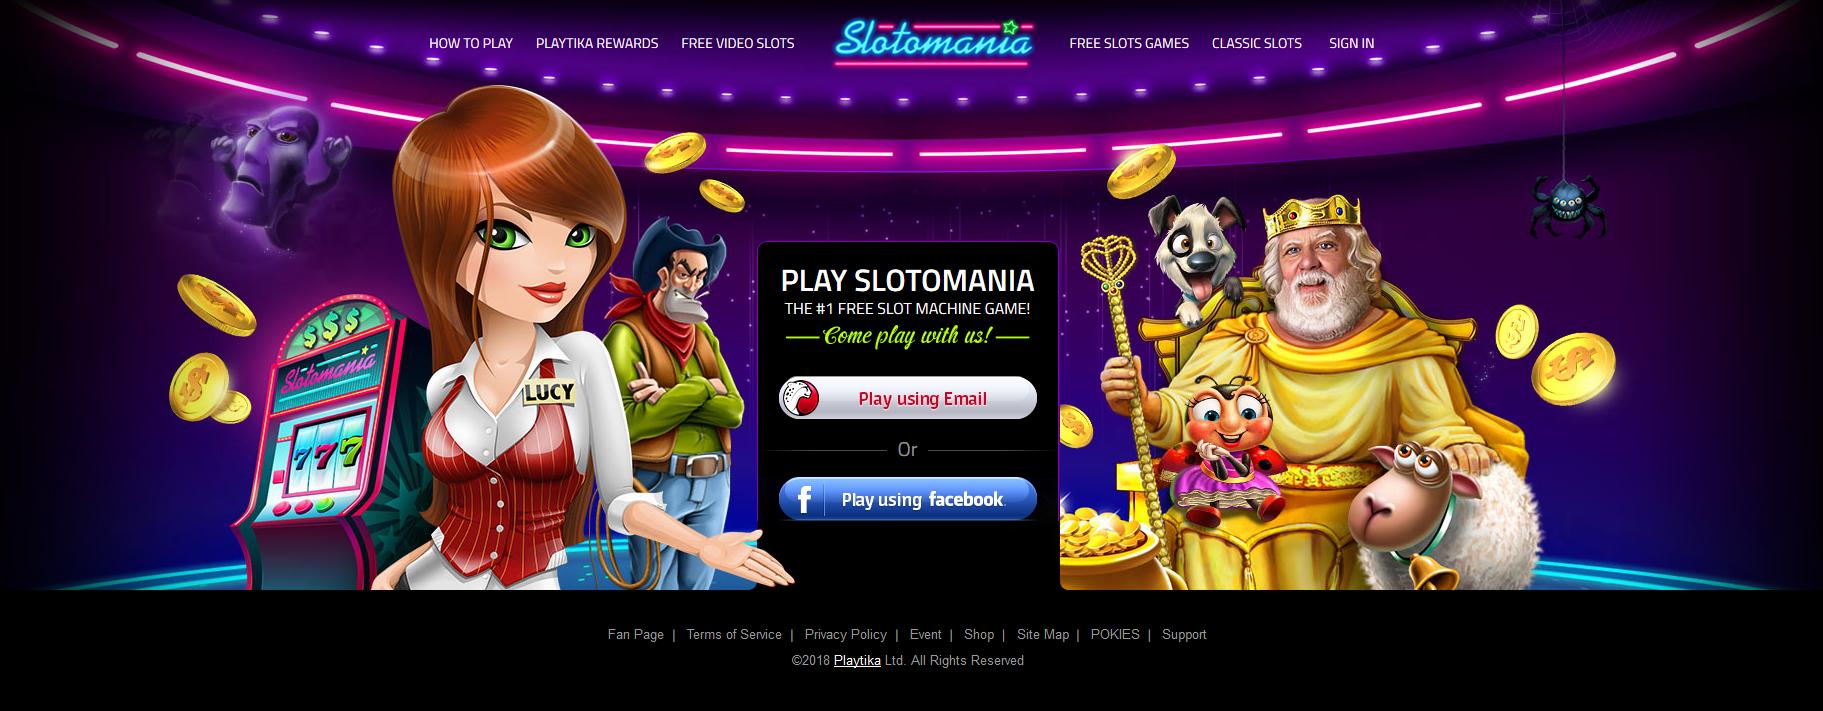 Slotomania Online Casino Activate 20 000 Free Coins Bonus